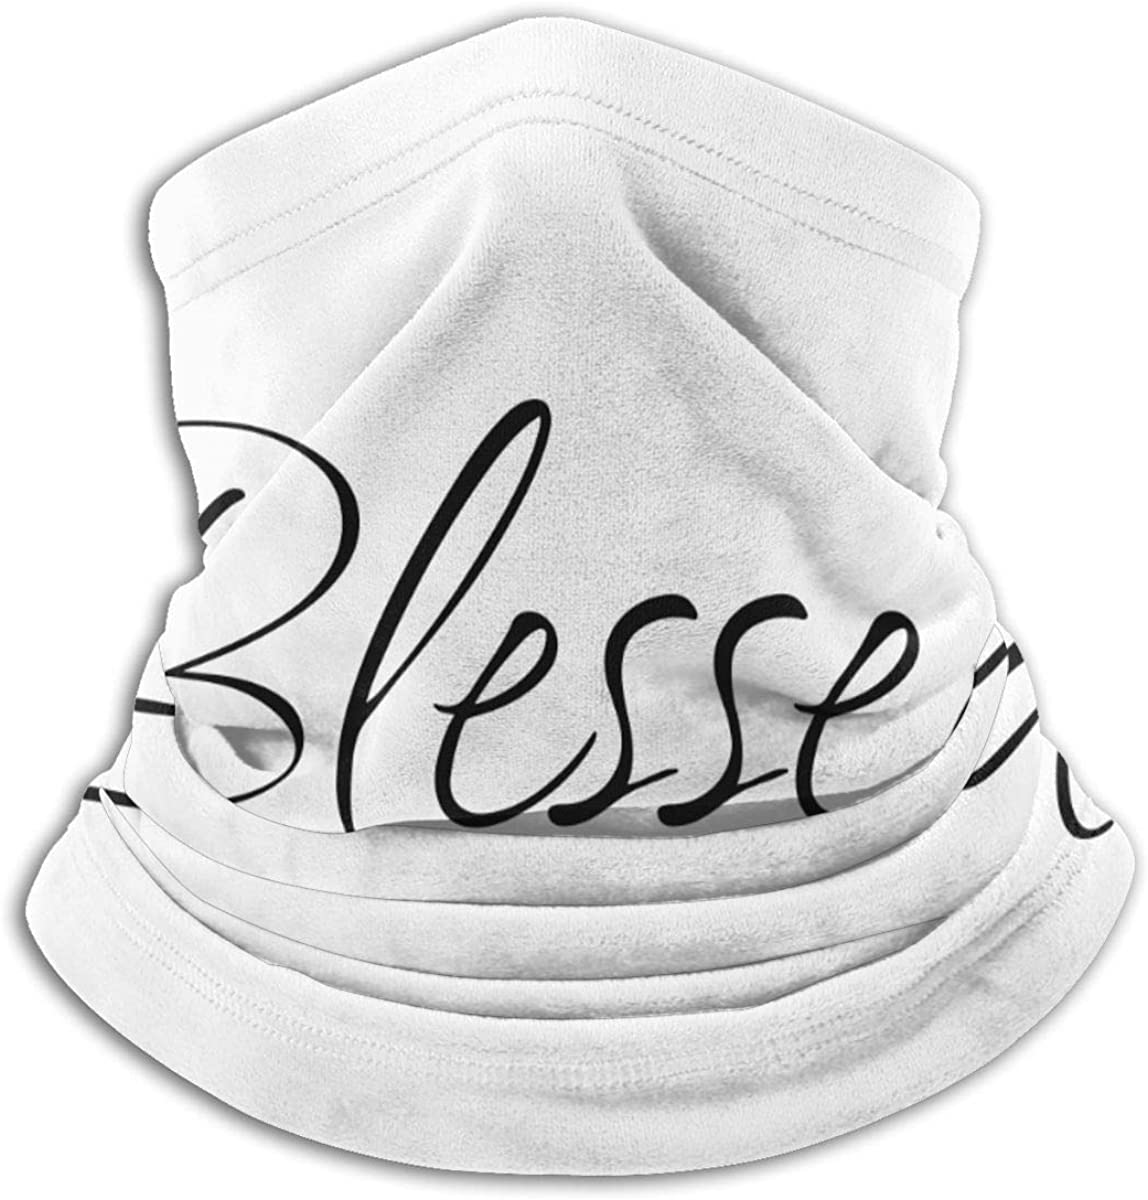 Blessed Black Multi-function Neck Warmer Gaiter Polyester Neck Warmer Windproof Winter Neck Gaiter Cold Weather Scarf For Men Women